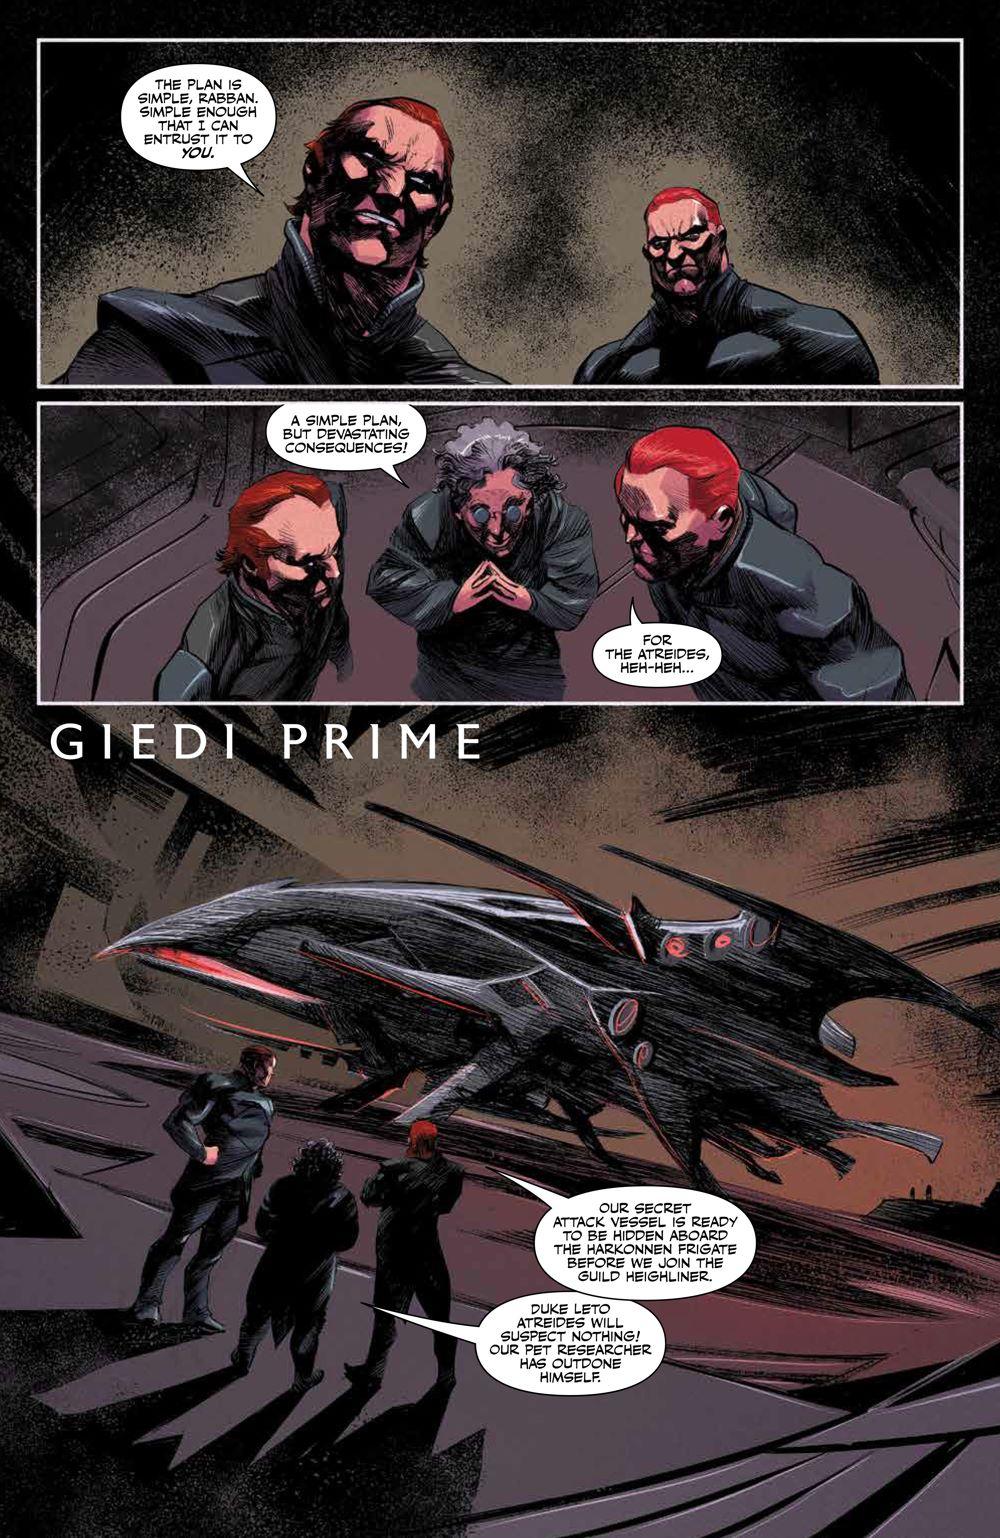 Dune_HouseAtreides_010_PRESS_7 ComicList Previews: DUNE HOUSE ATREIDES #10 (OF 12)